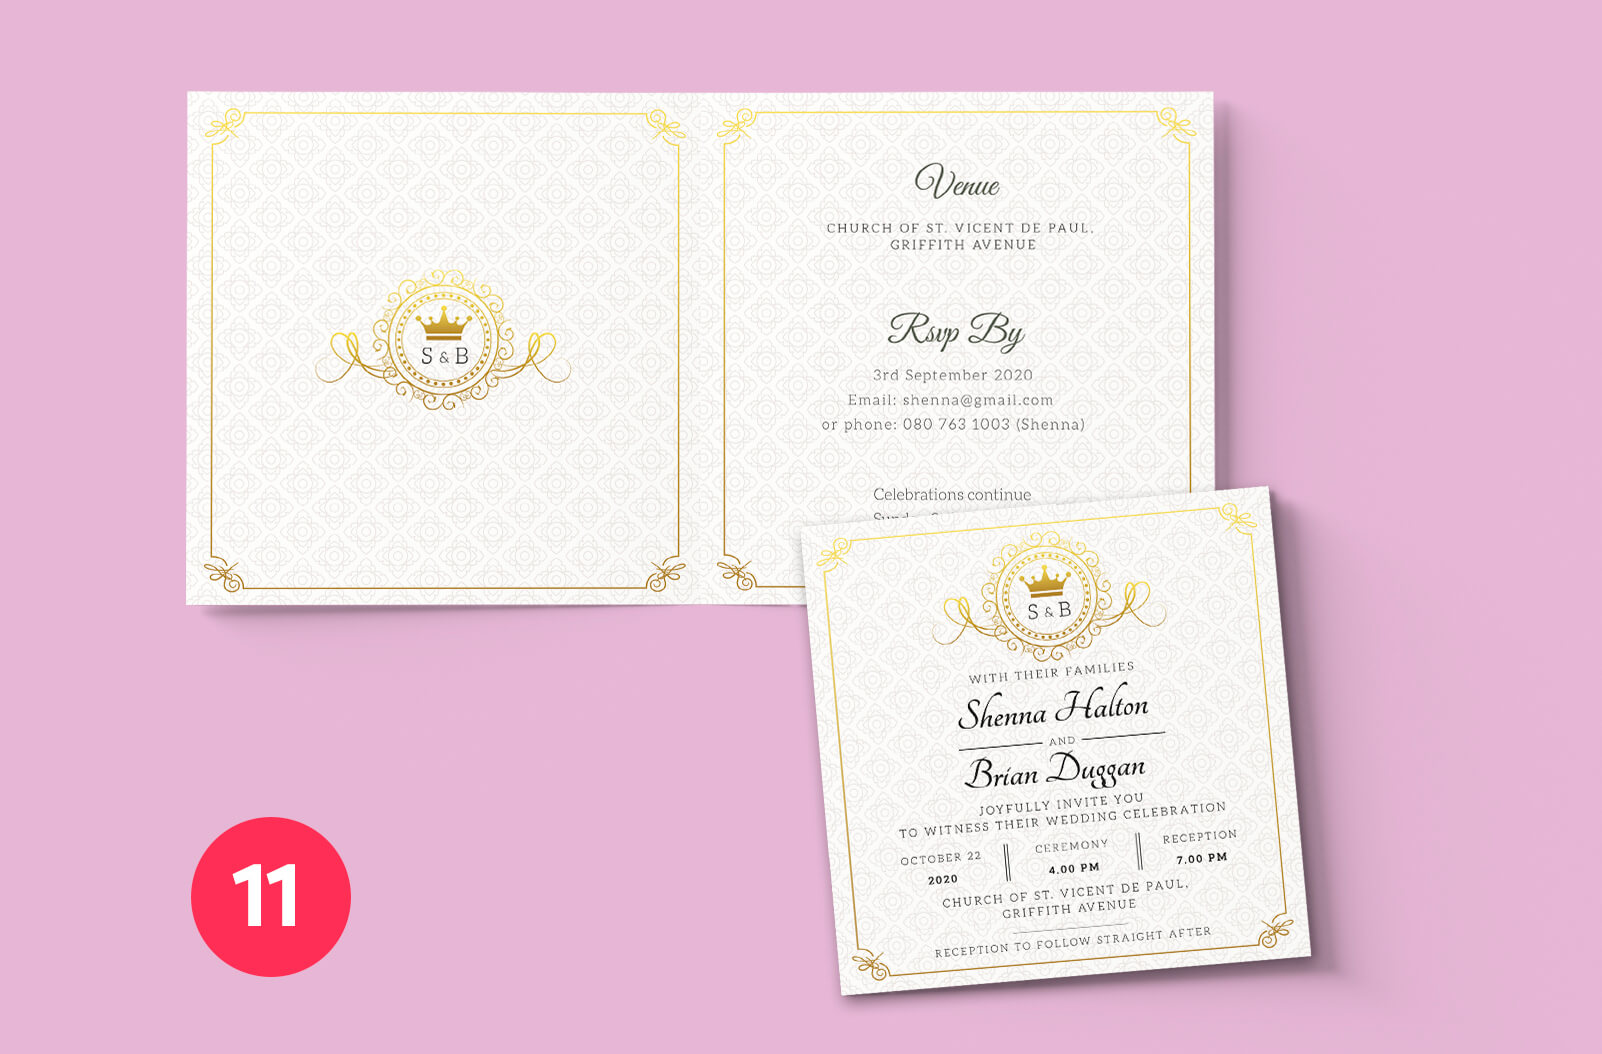 Print Ready Dublin - Wedding Invitation Mockup